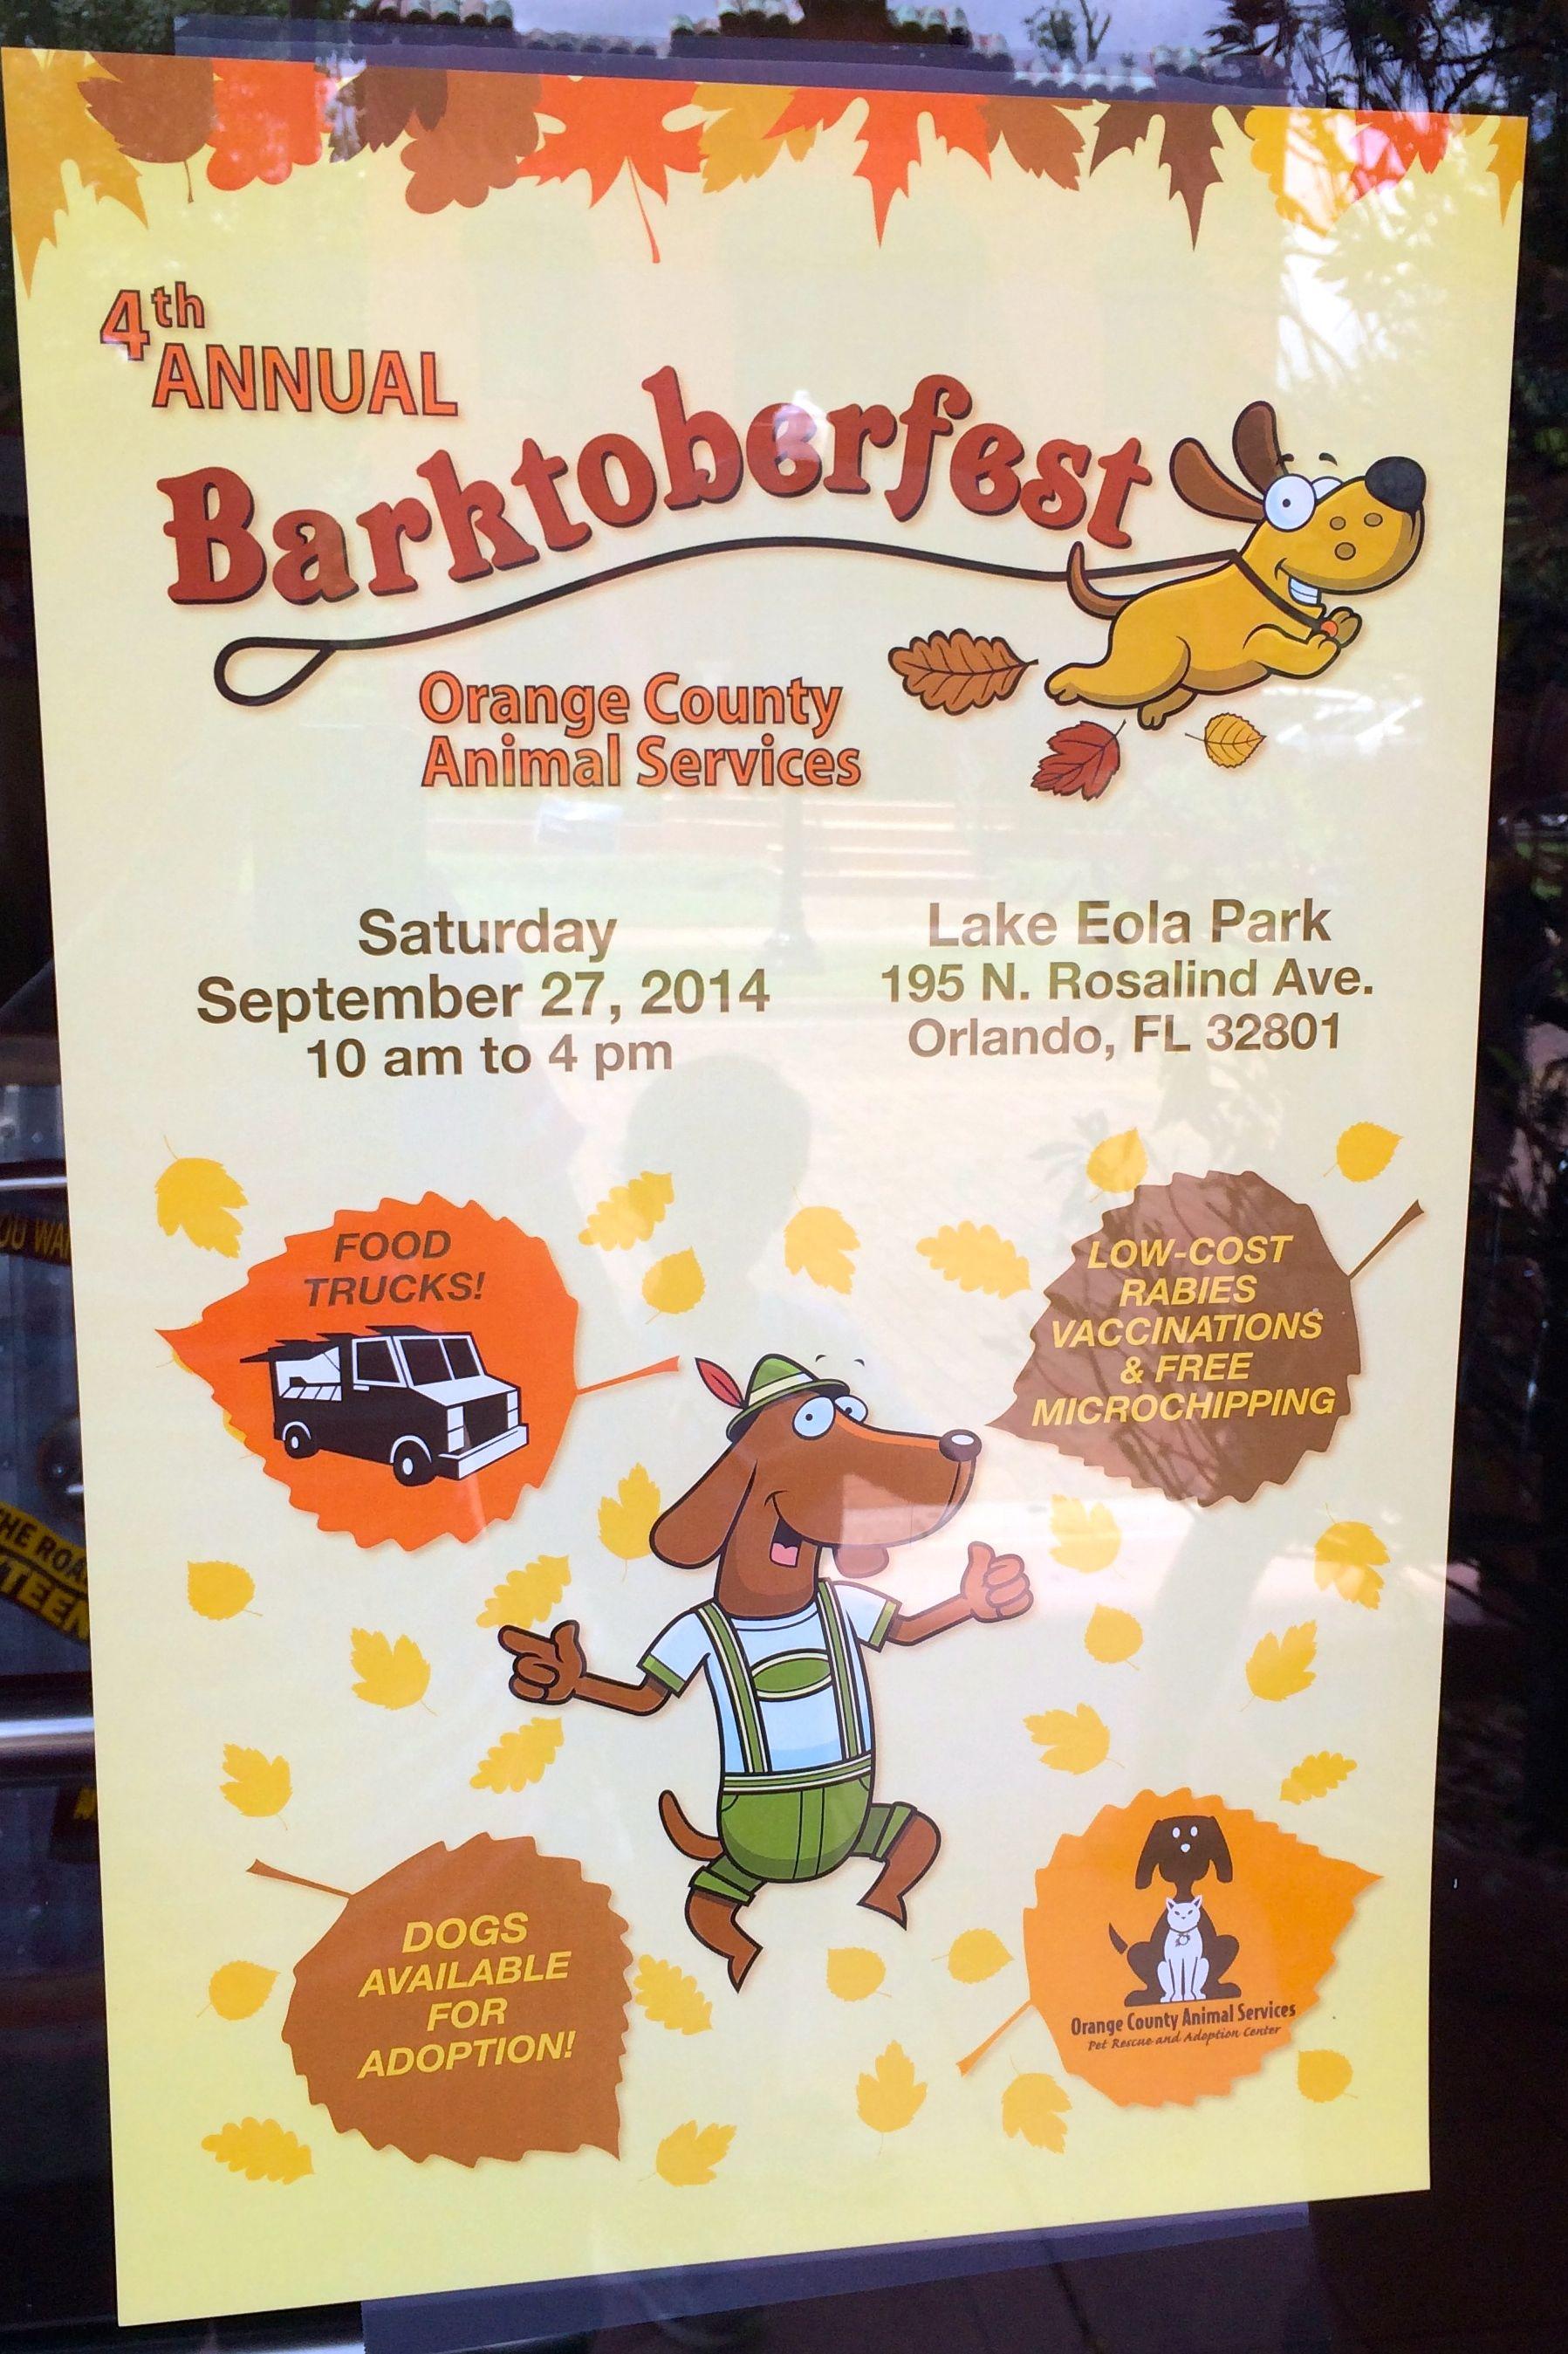 4th Annual BARKTOBERFEST Adoption Event At Lake Eola Park #AdoptDontBuy